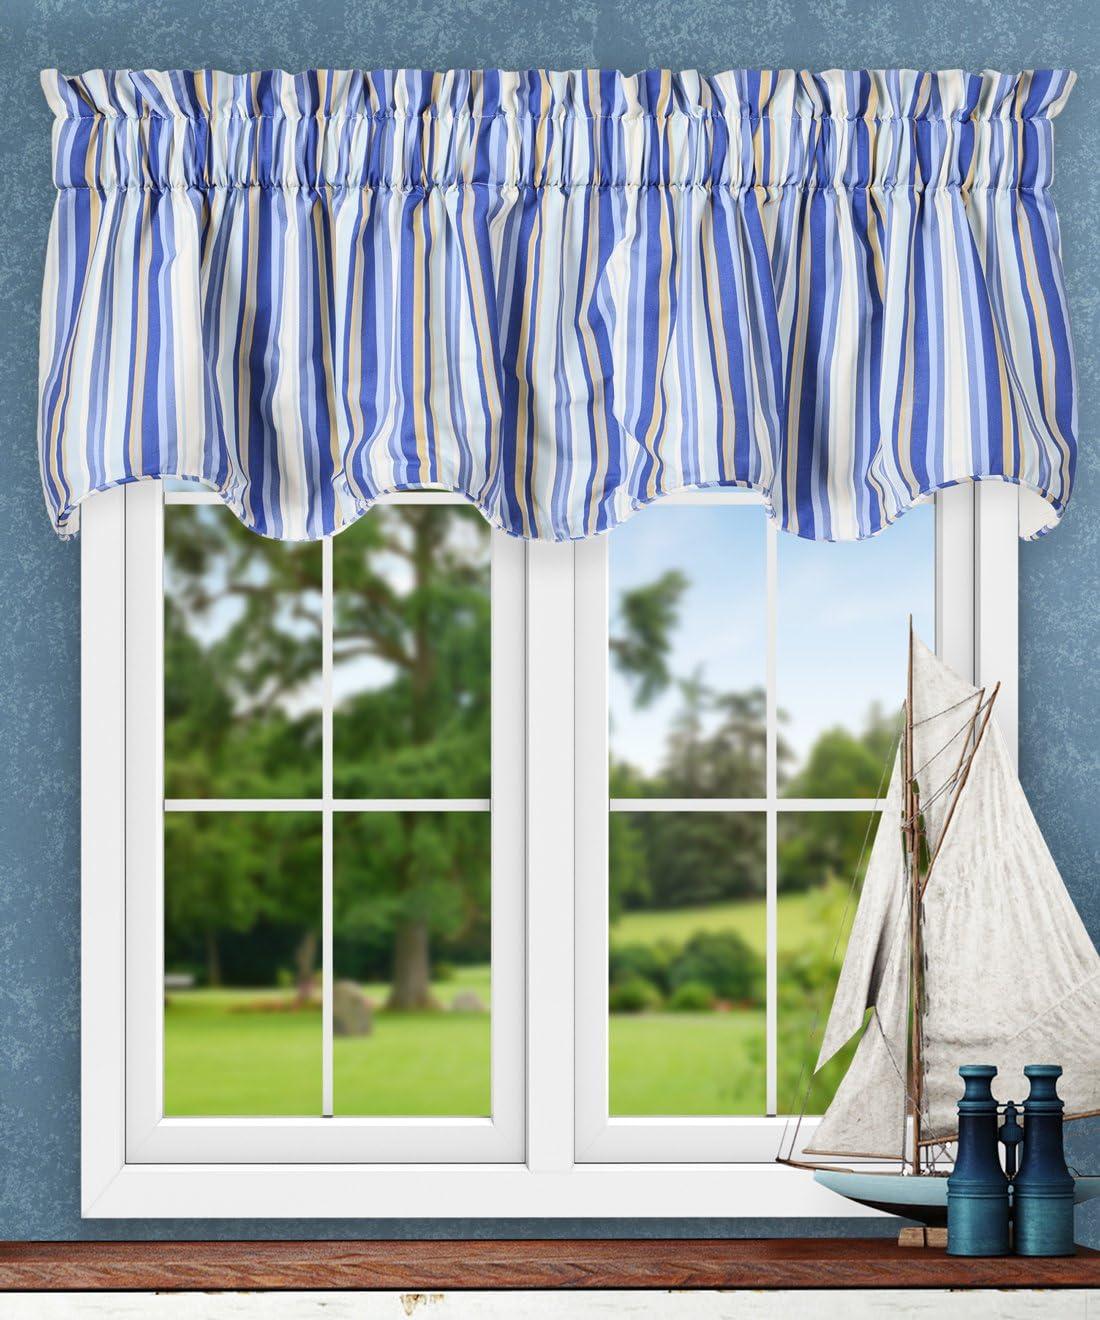 Ellis Curtain Mason Multi Colored Stripe Lined Scallop Valance, 70 x 17 , Blue